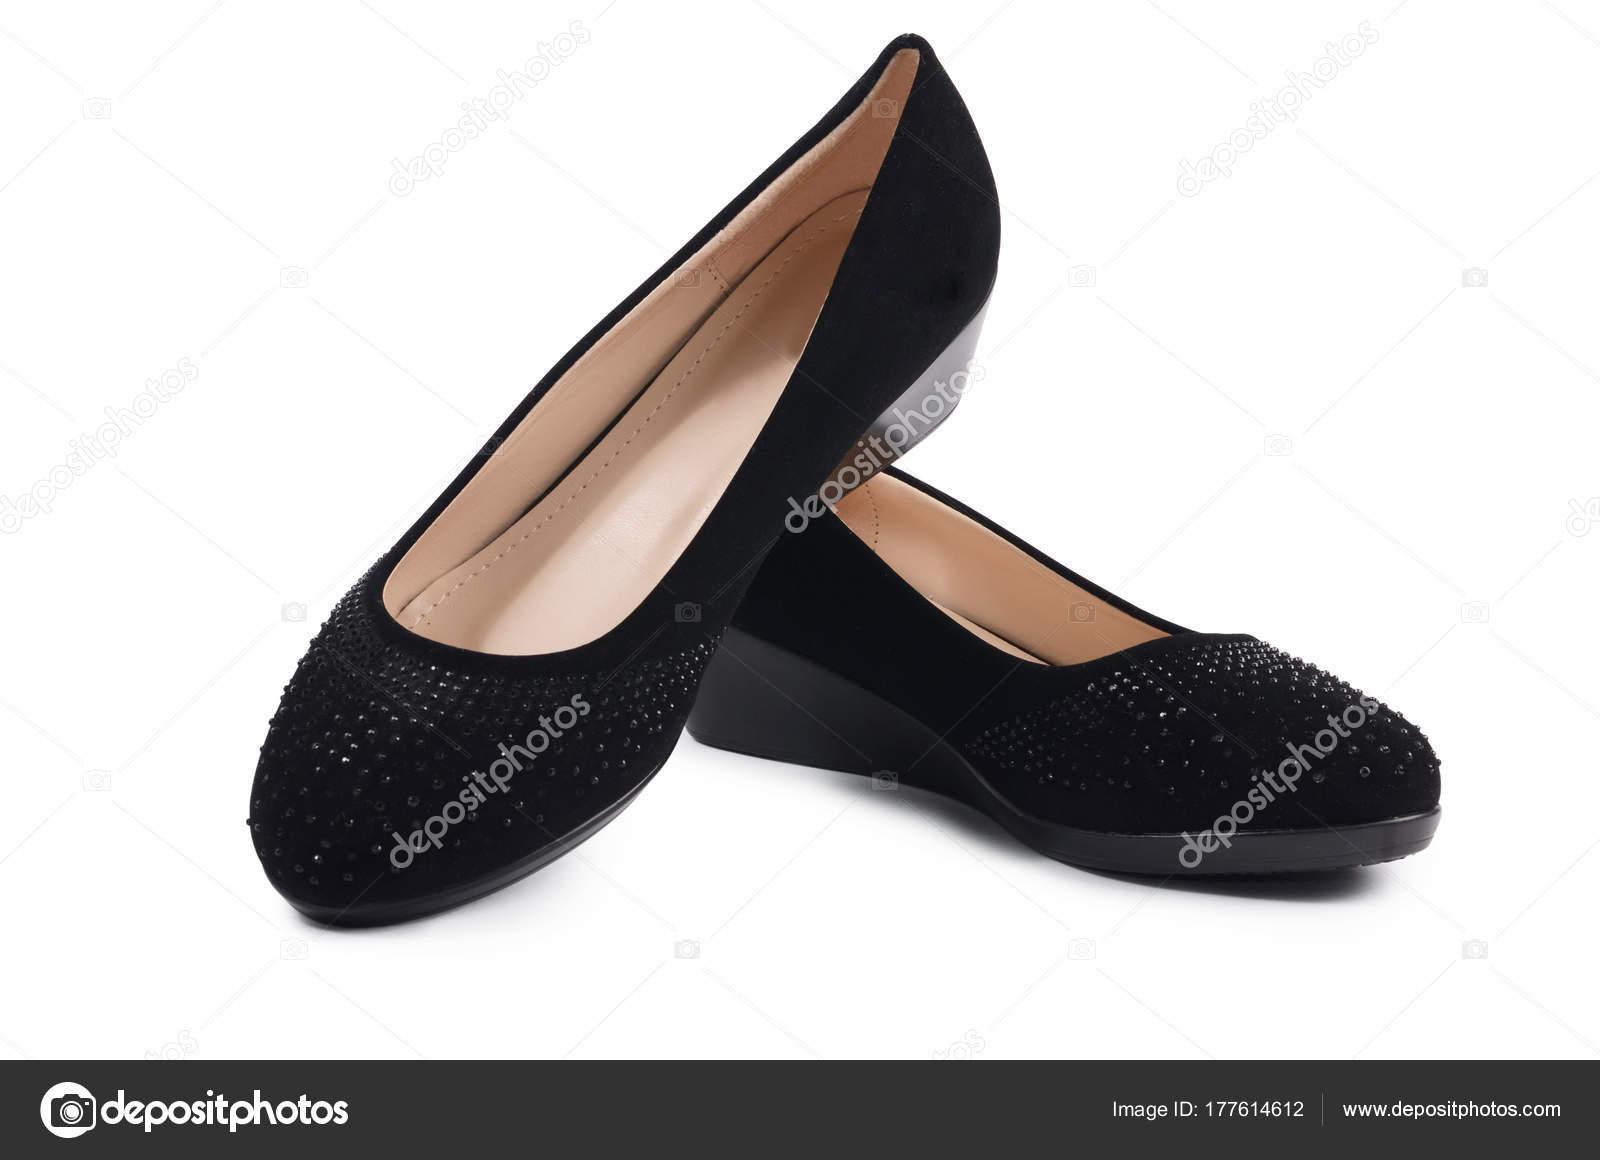 Blanco Fondo Sobre Aislados Zapatos Mujer Negros xn8q8PzZ